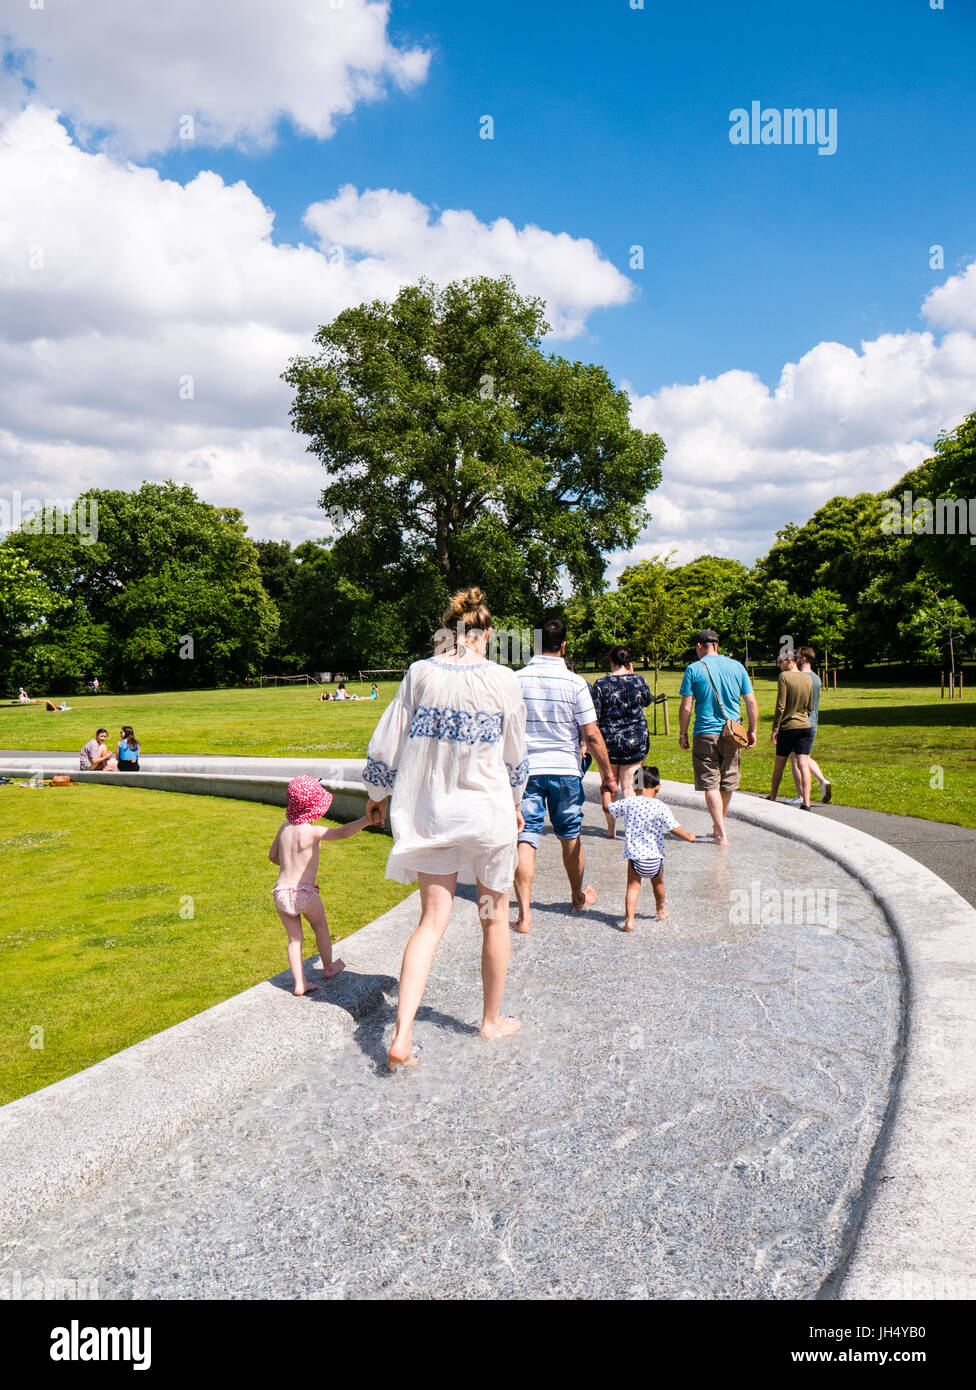 People Enjoying Sunshine, Princess Diana Memorial Fountain, Hyde Park, London, England Stock Photo